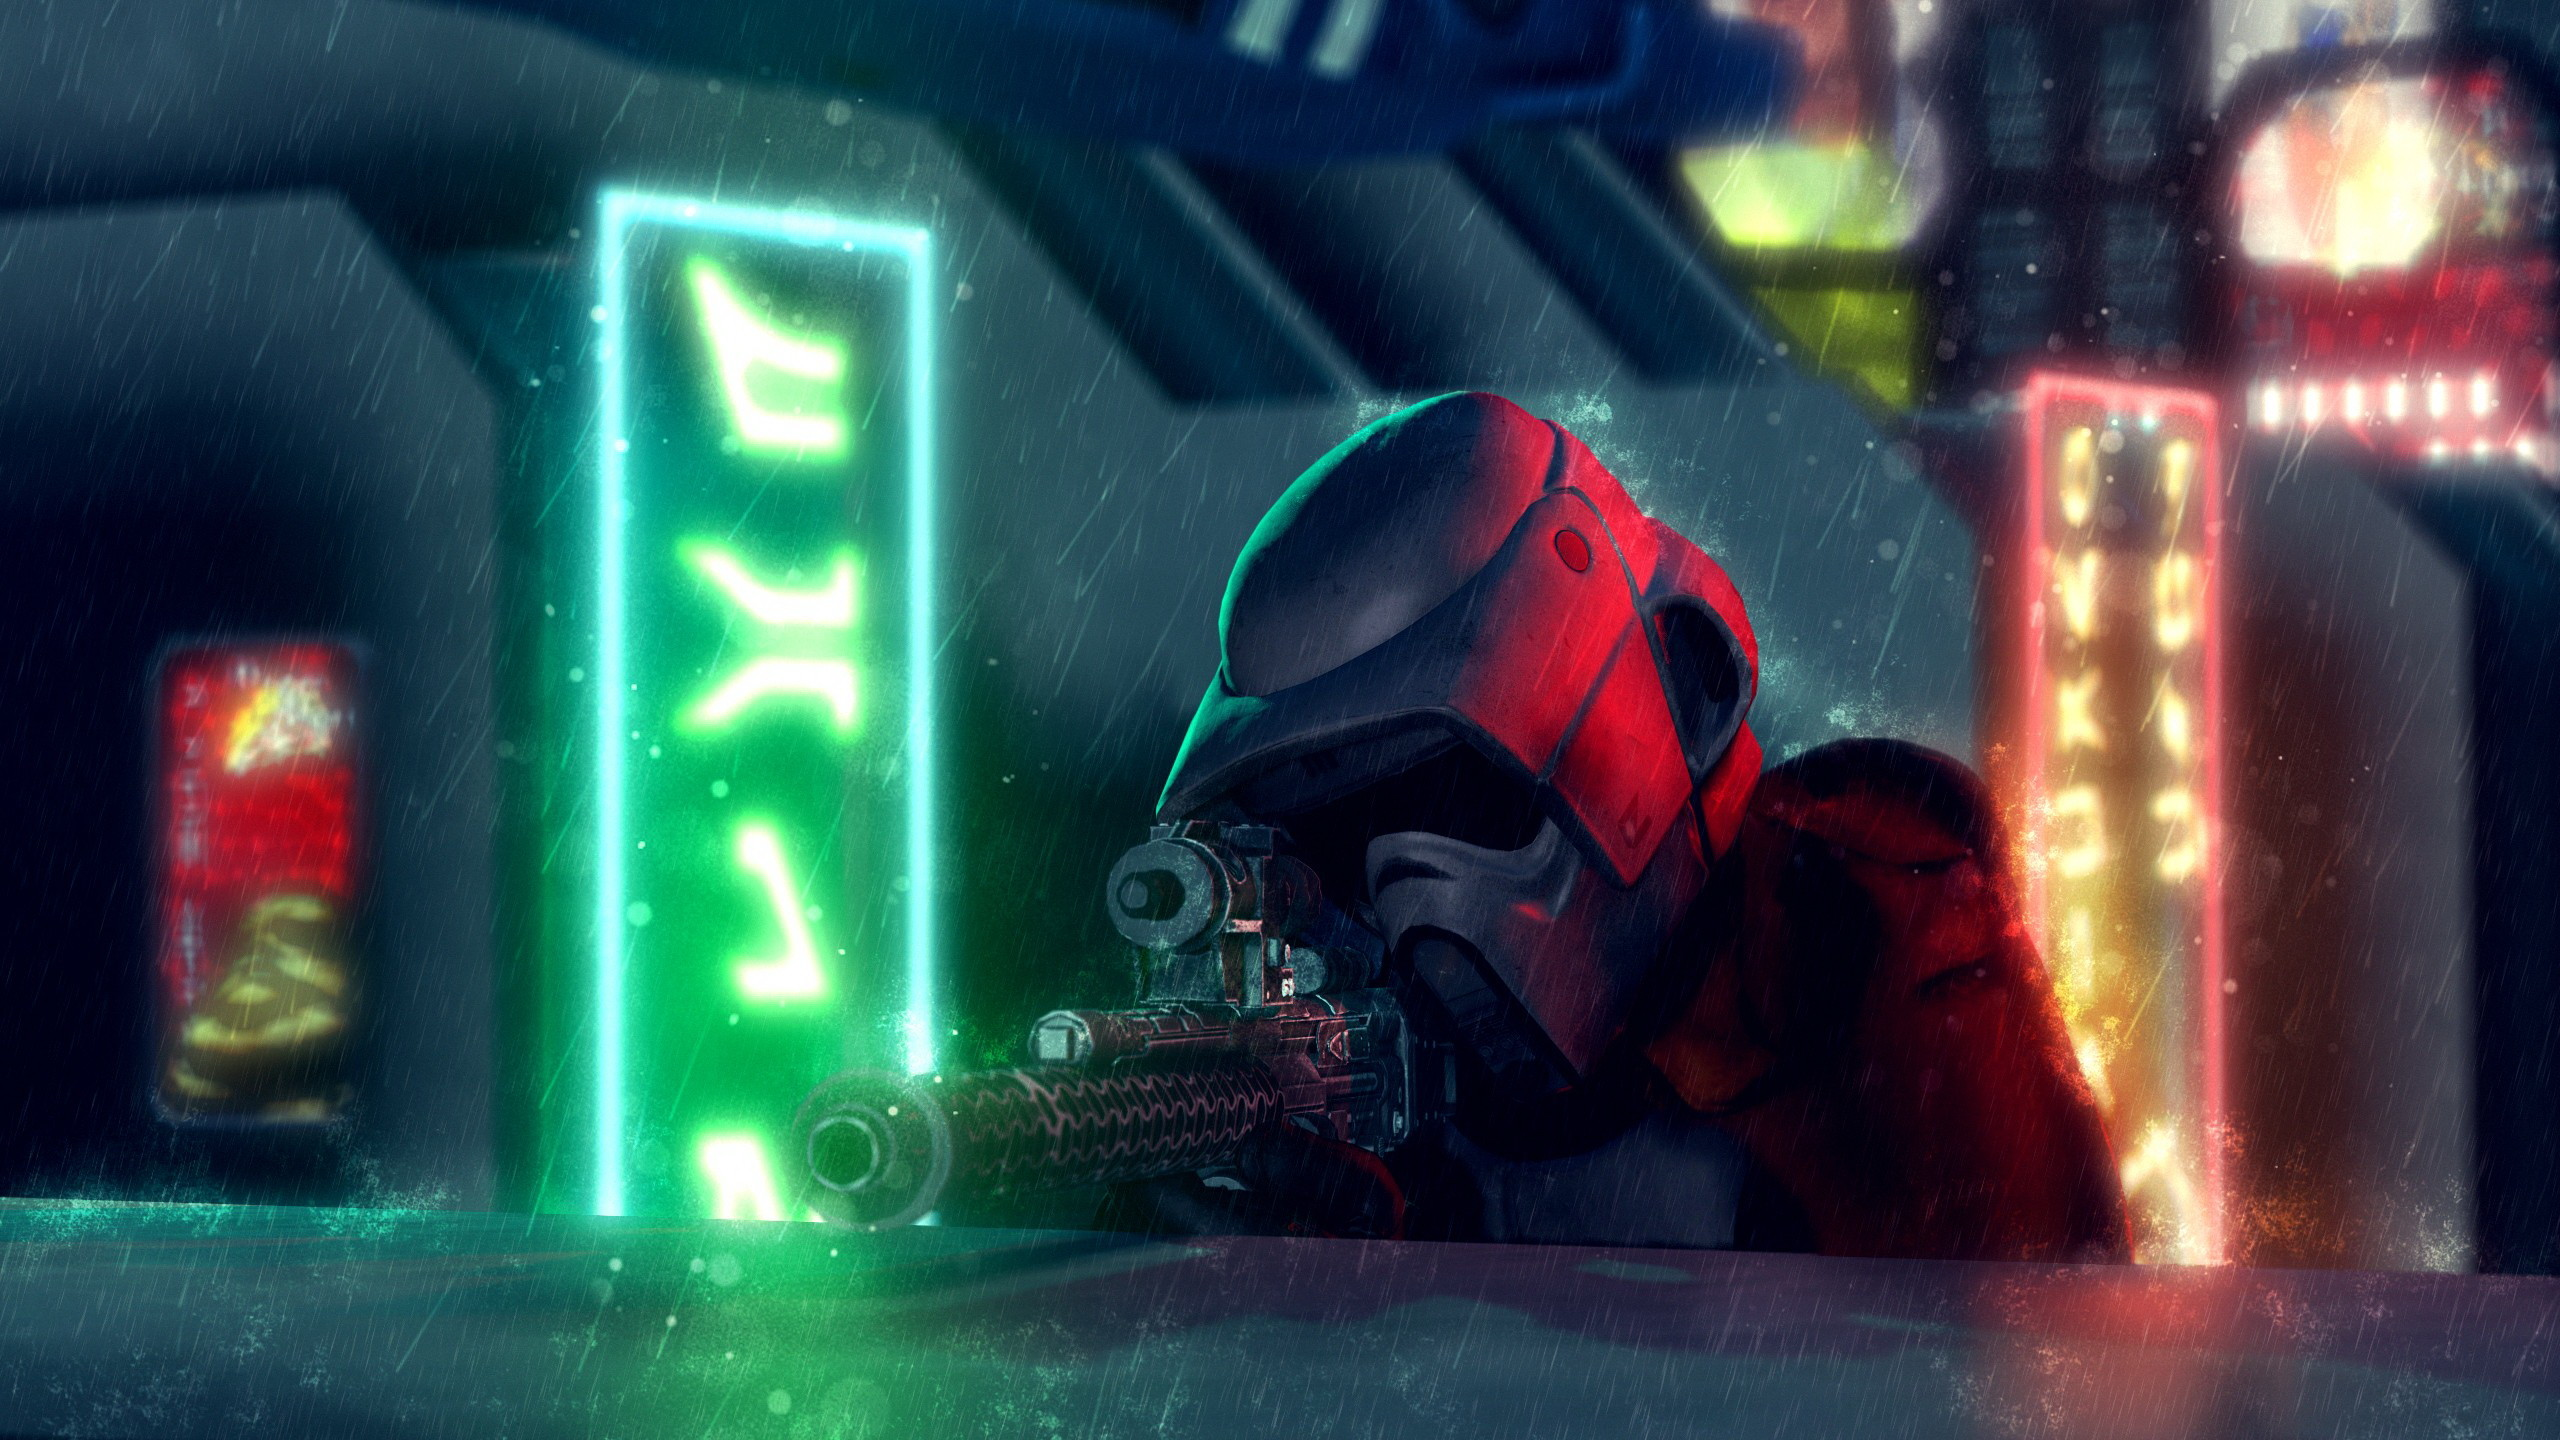 Sci Fi – Star Wars Sniper Scout Trooper Wallpaper